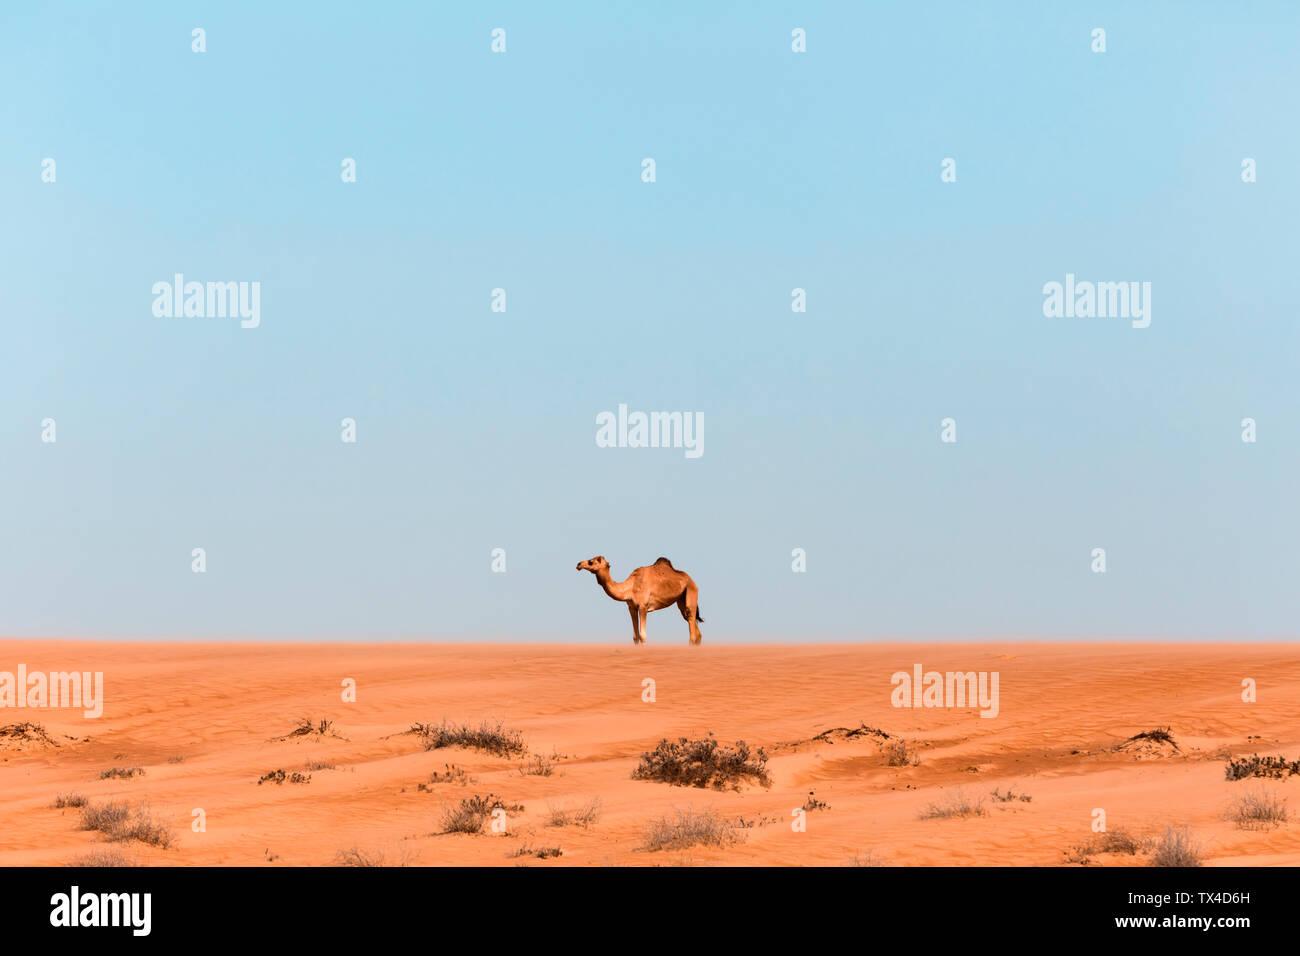 Dromedary in Wahiba sands desert, Oman Stock Photo